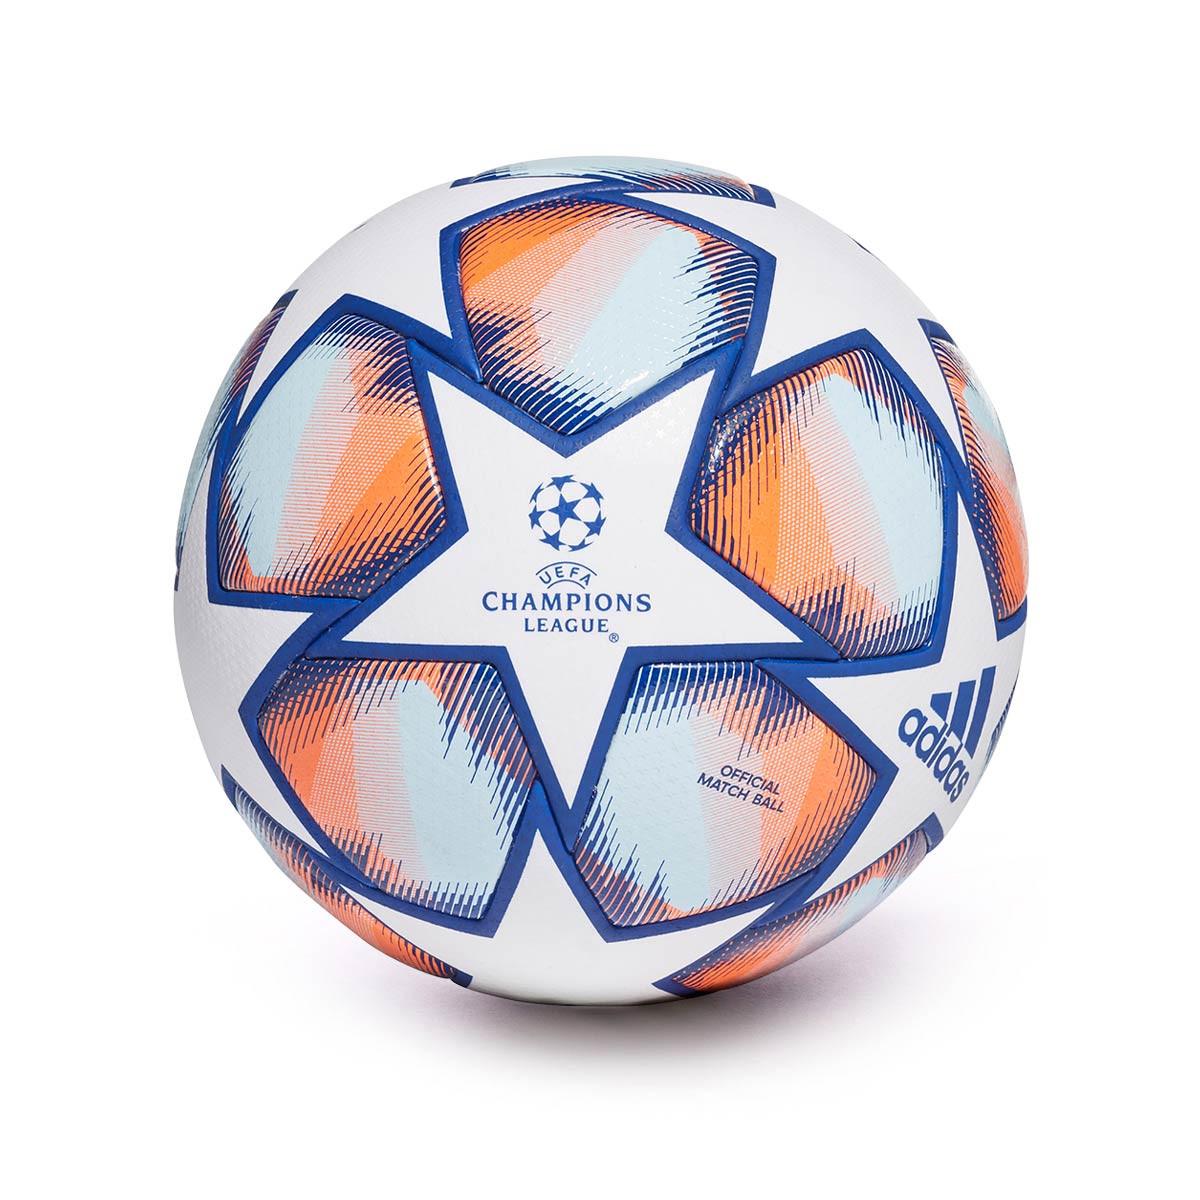 Ball adidas Finale 20 Pro Champions League White-Team royal blue ...